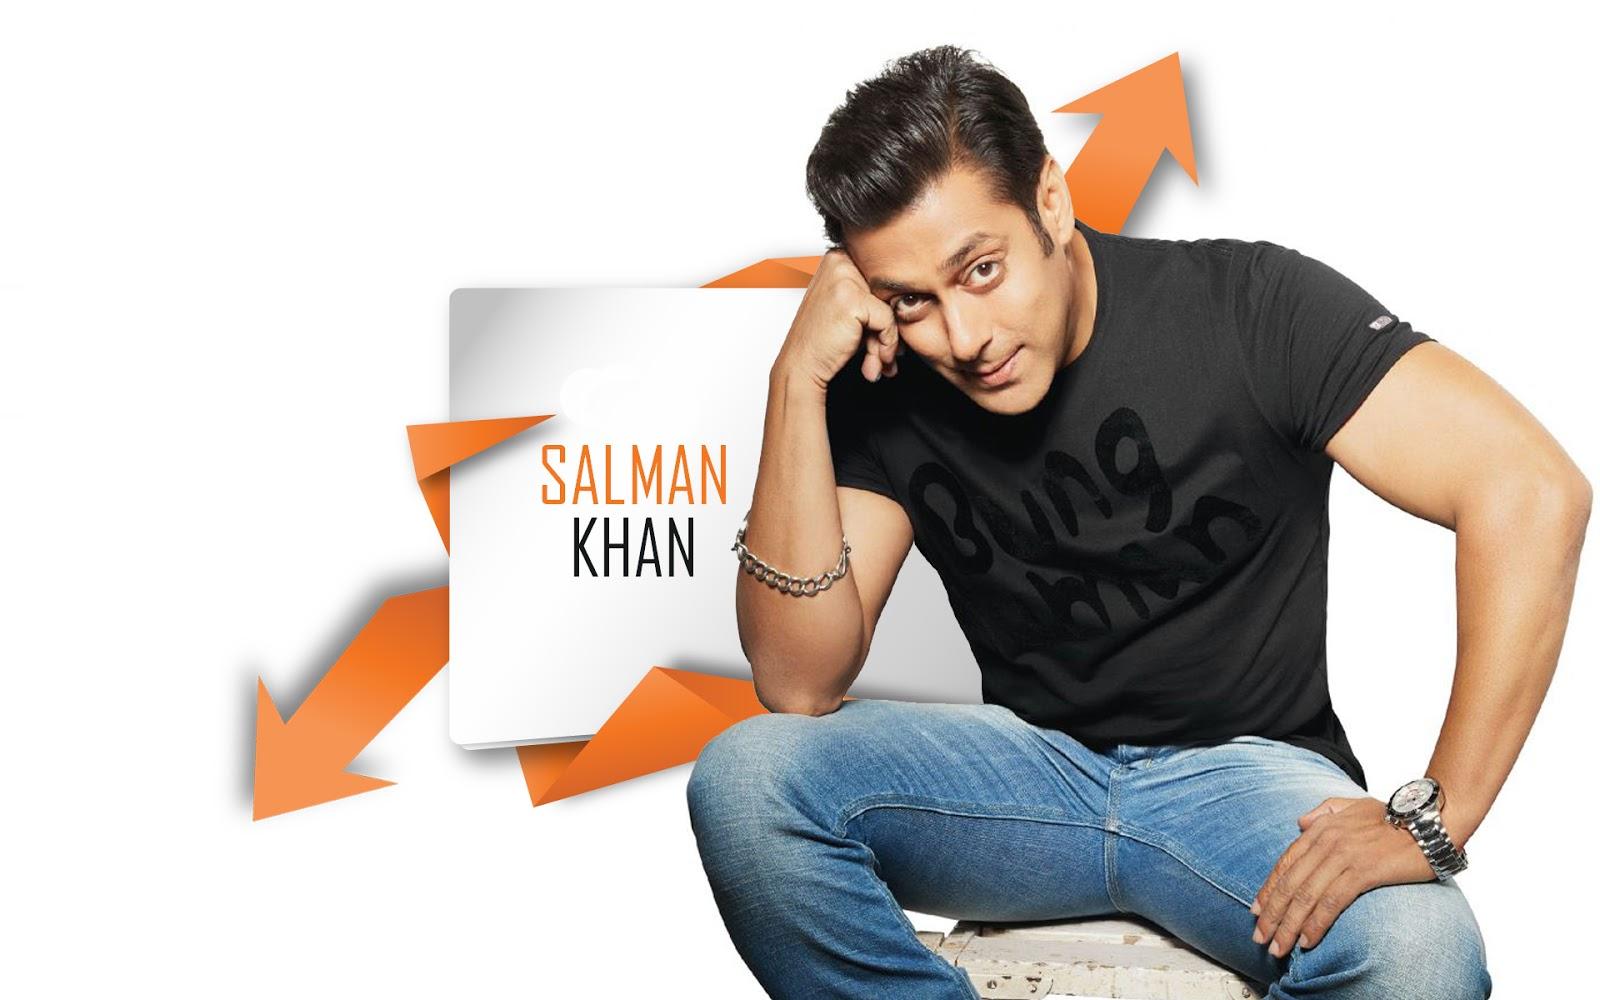 Salman Khan Hd Wallpapers In 1080p